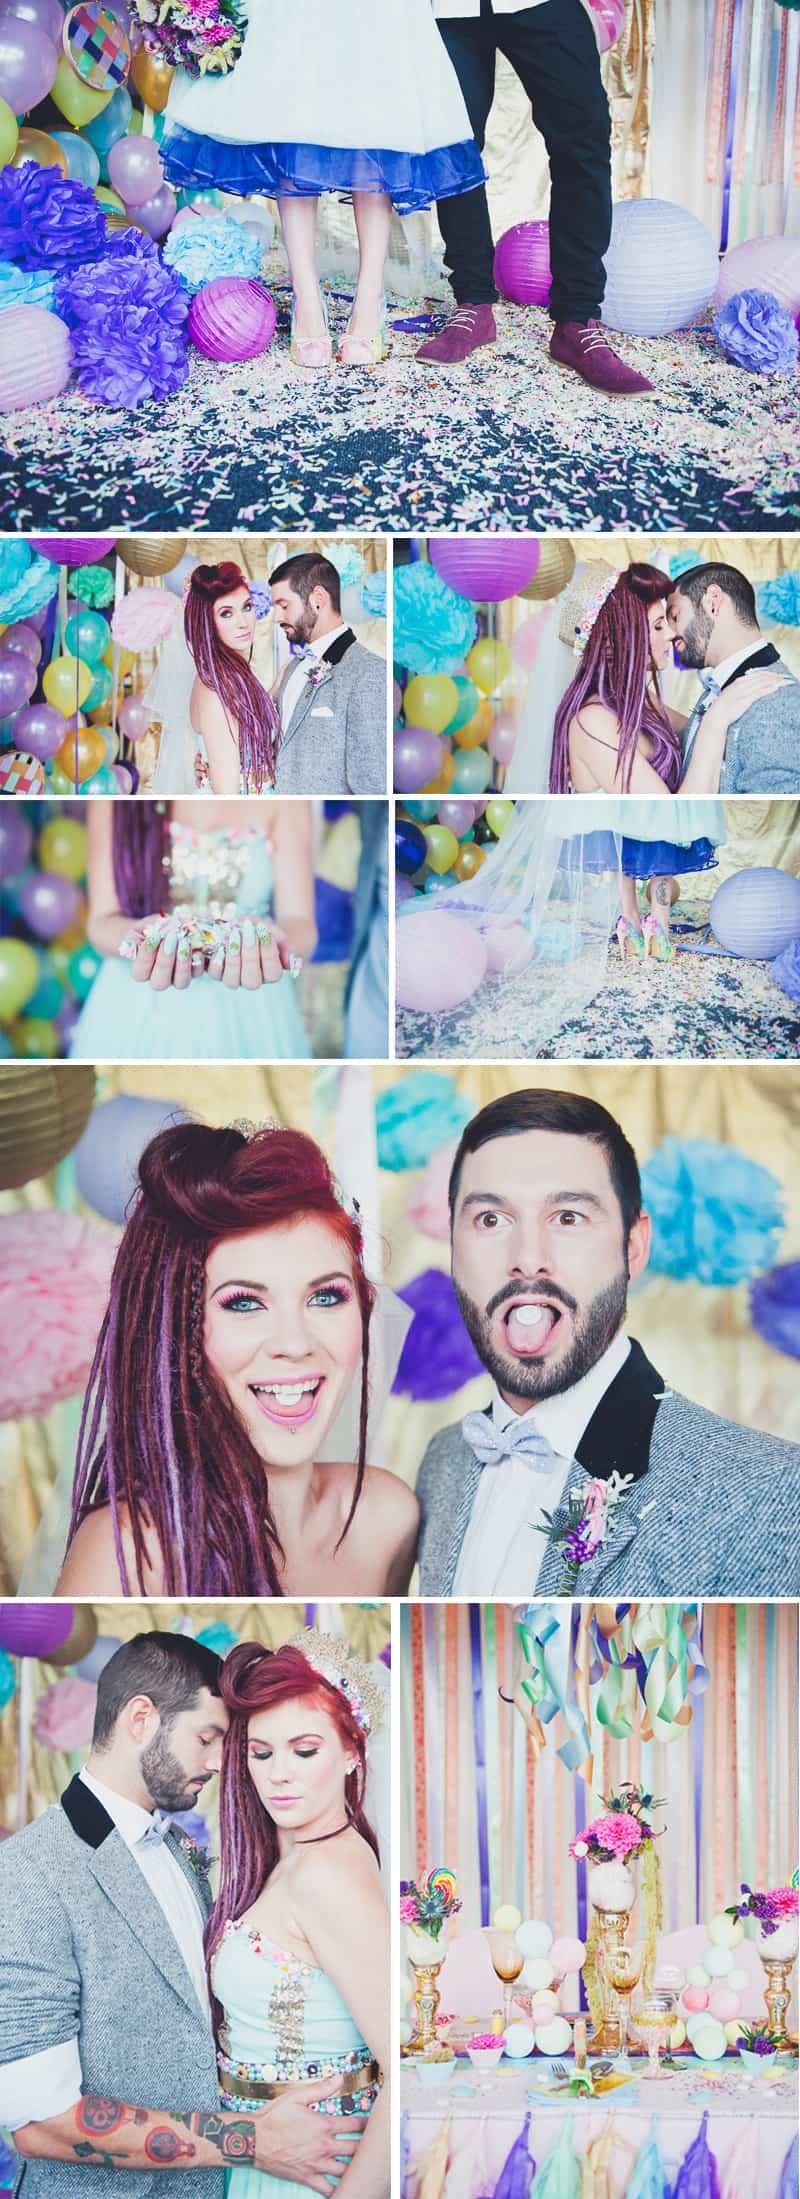 Willy Wonka Weird Wonderful Wedding World 3